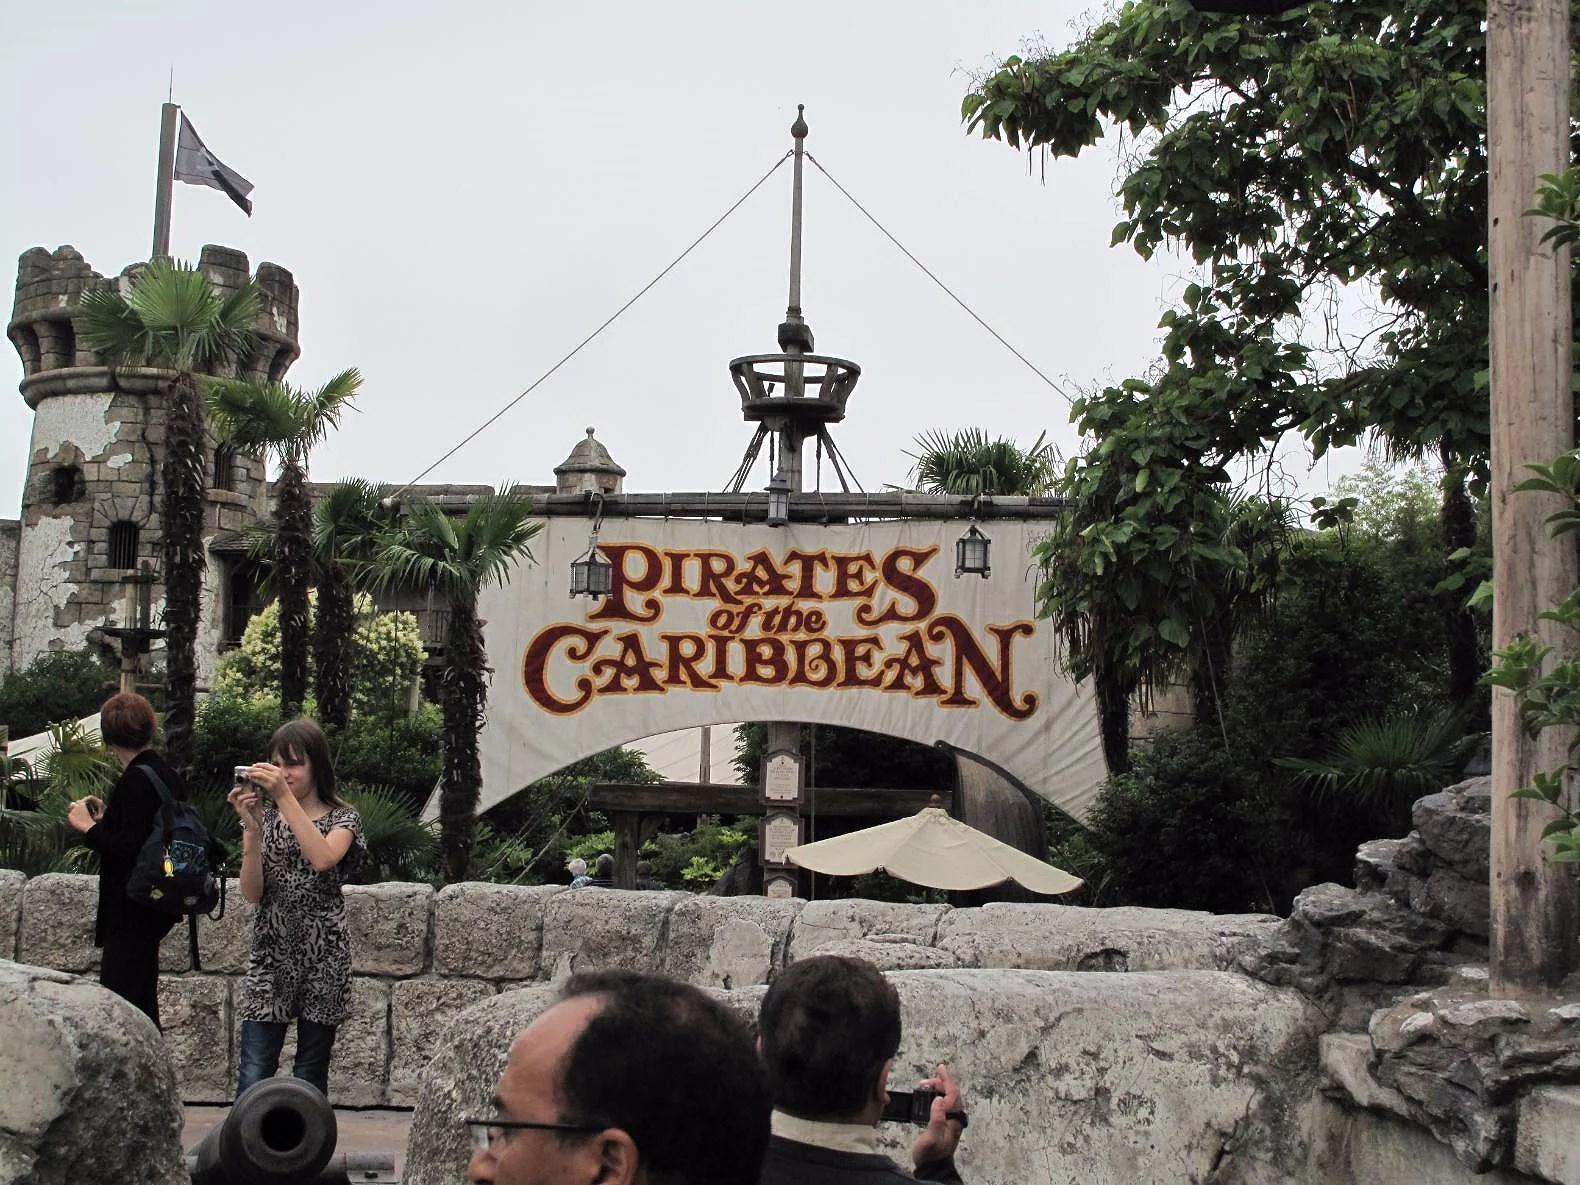 Pirates of the Carribean attraktionen nyöppnar på Disneyland Paris